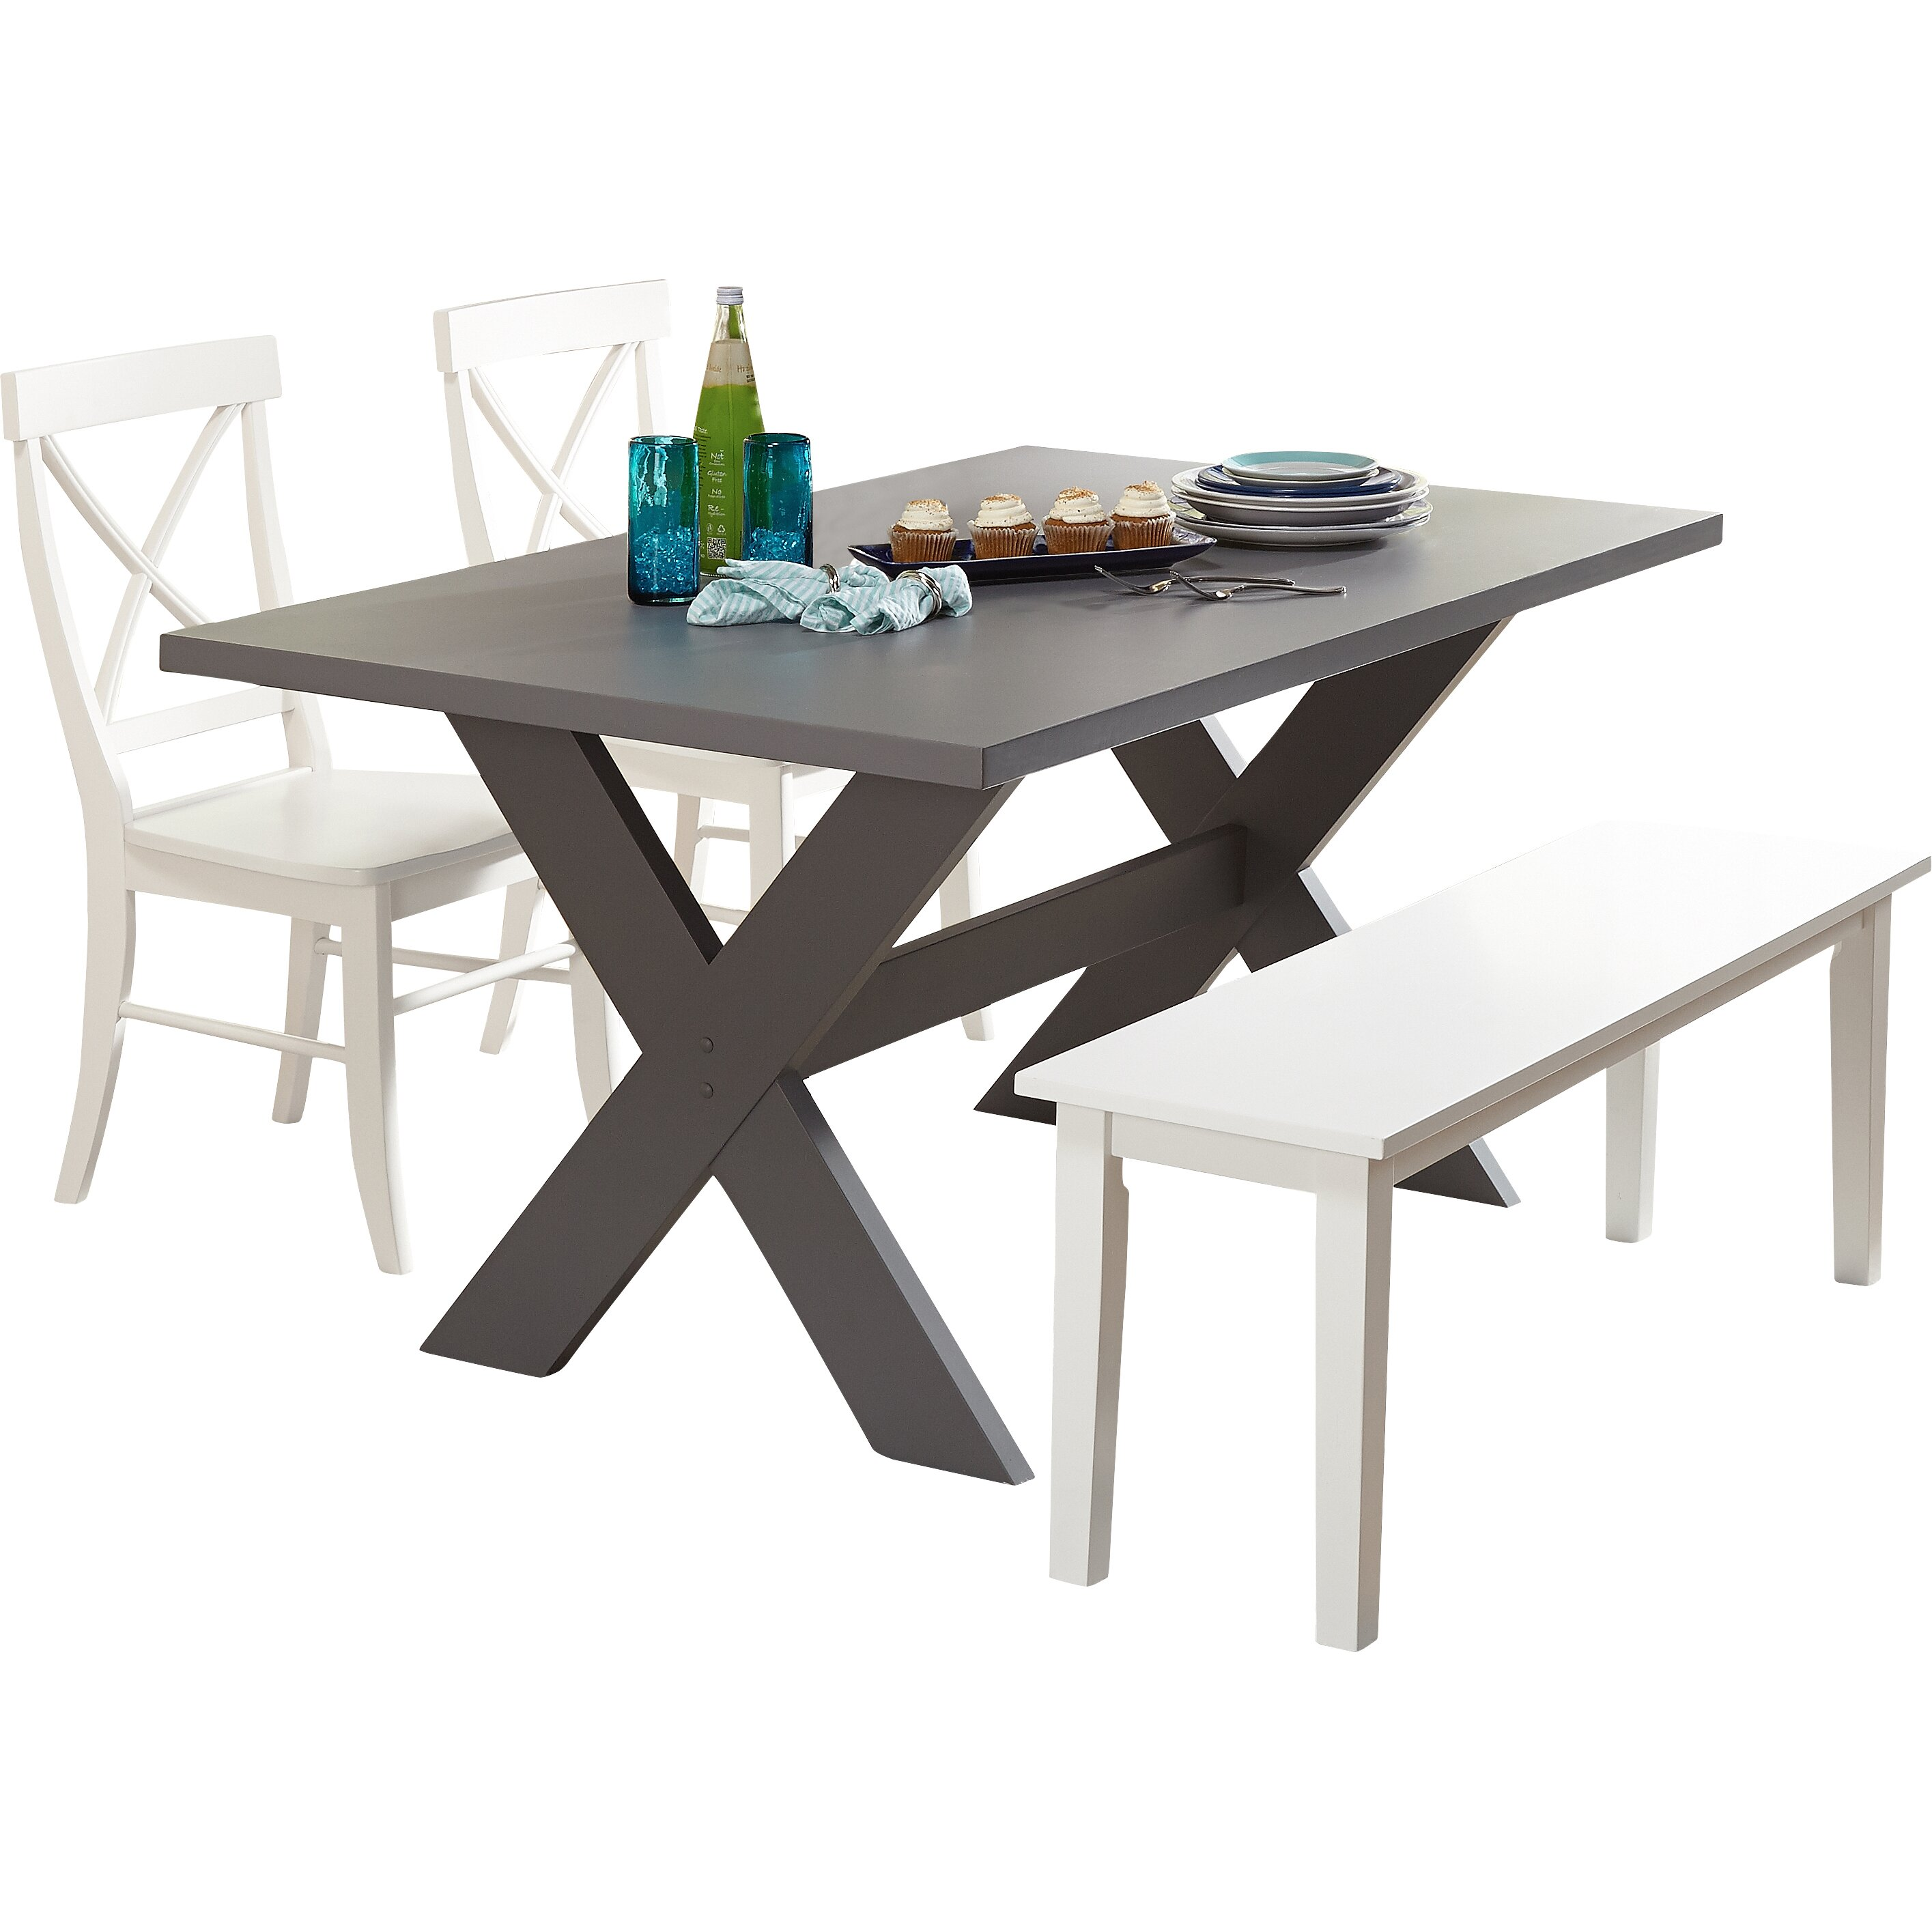 Beachcrest home medulla 4 piece dining set reviews wayfair for 4 piece dining room set